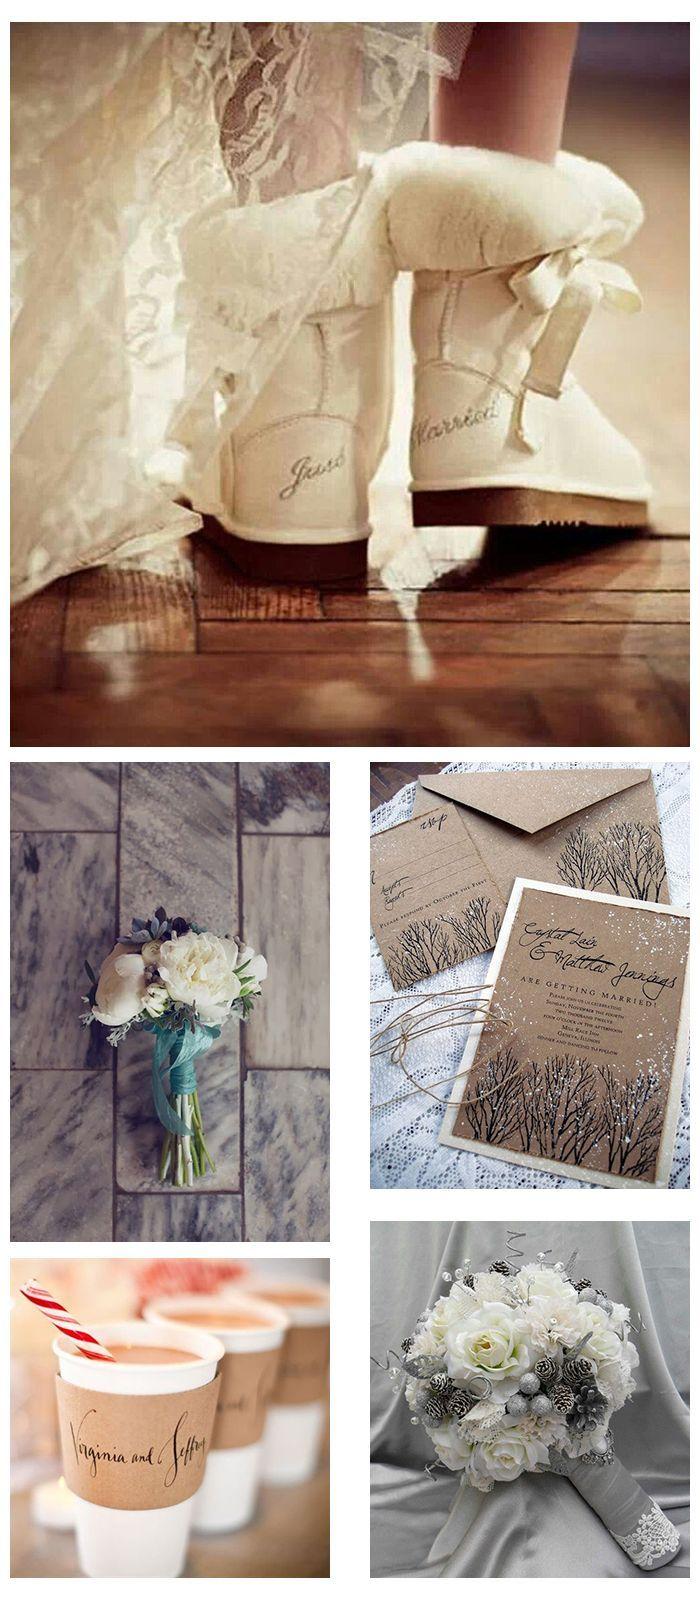 Inspirationsboard Winter wedding «in wedding fever